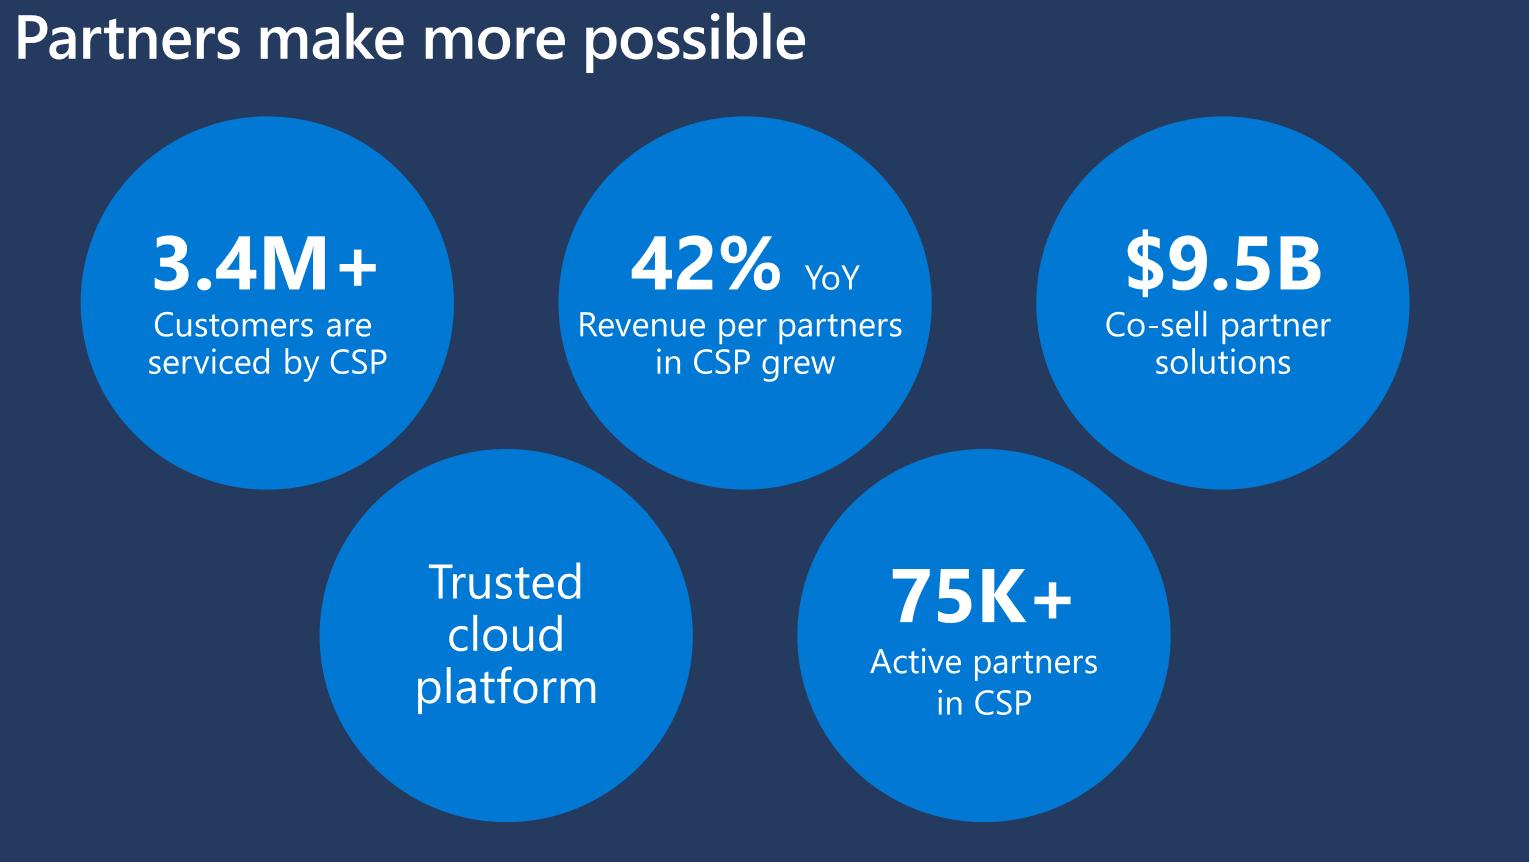 microsoft partners make more possible